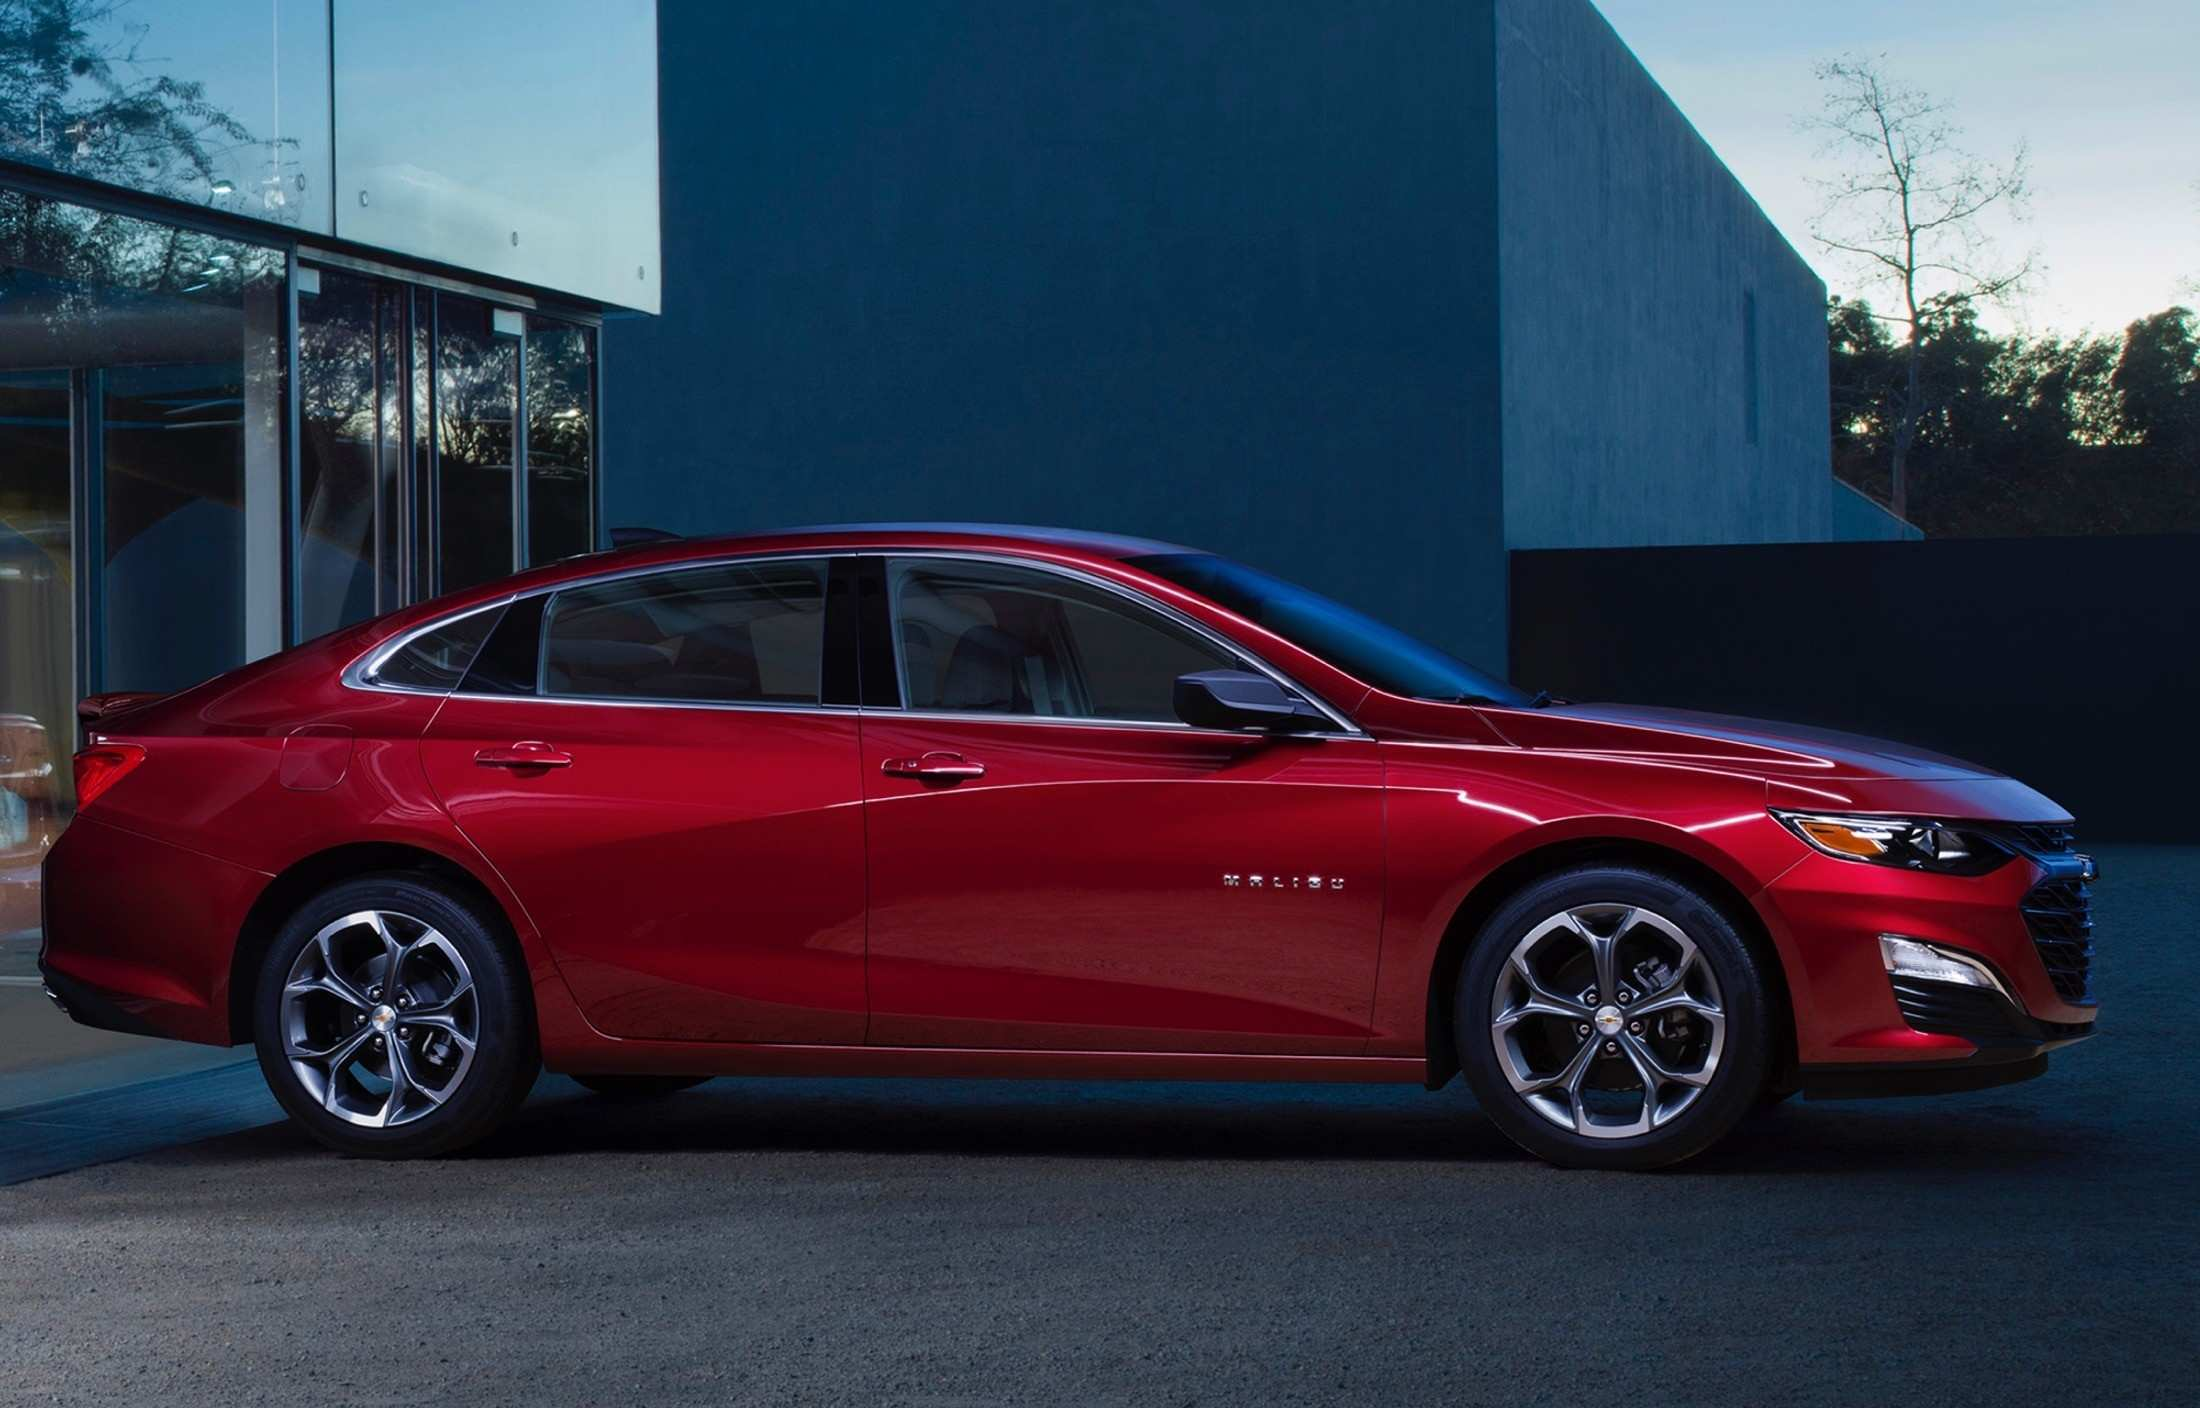 18 New New Chevrolet Malibu 2019 Release Date Exterior And Interior Review New Review by New Chevrolet Malibu 2019 Release Date Exterior And Interior Review